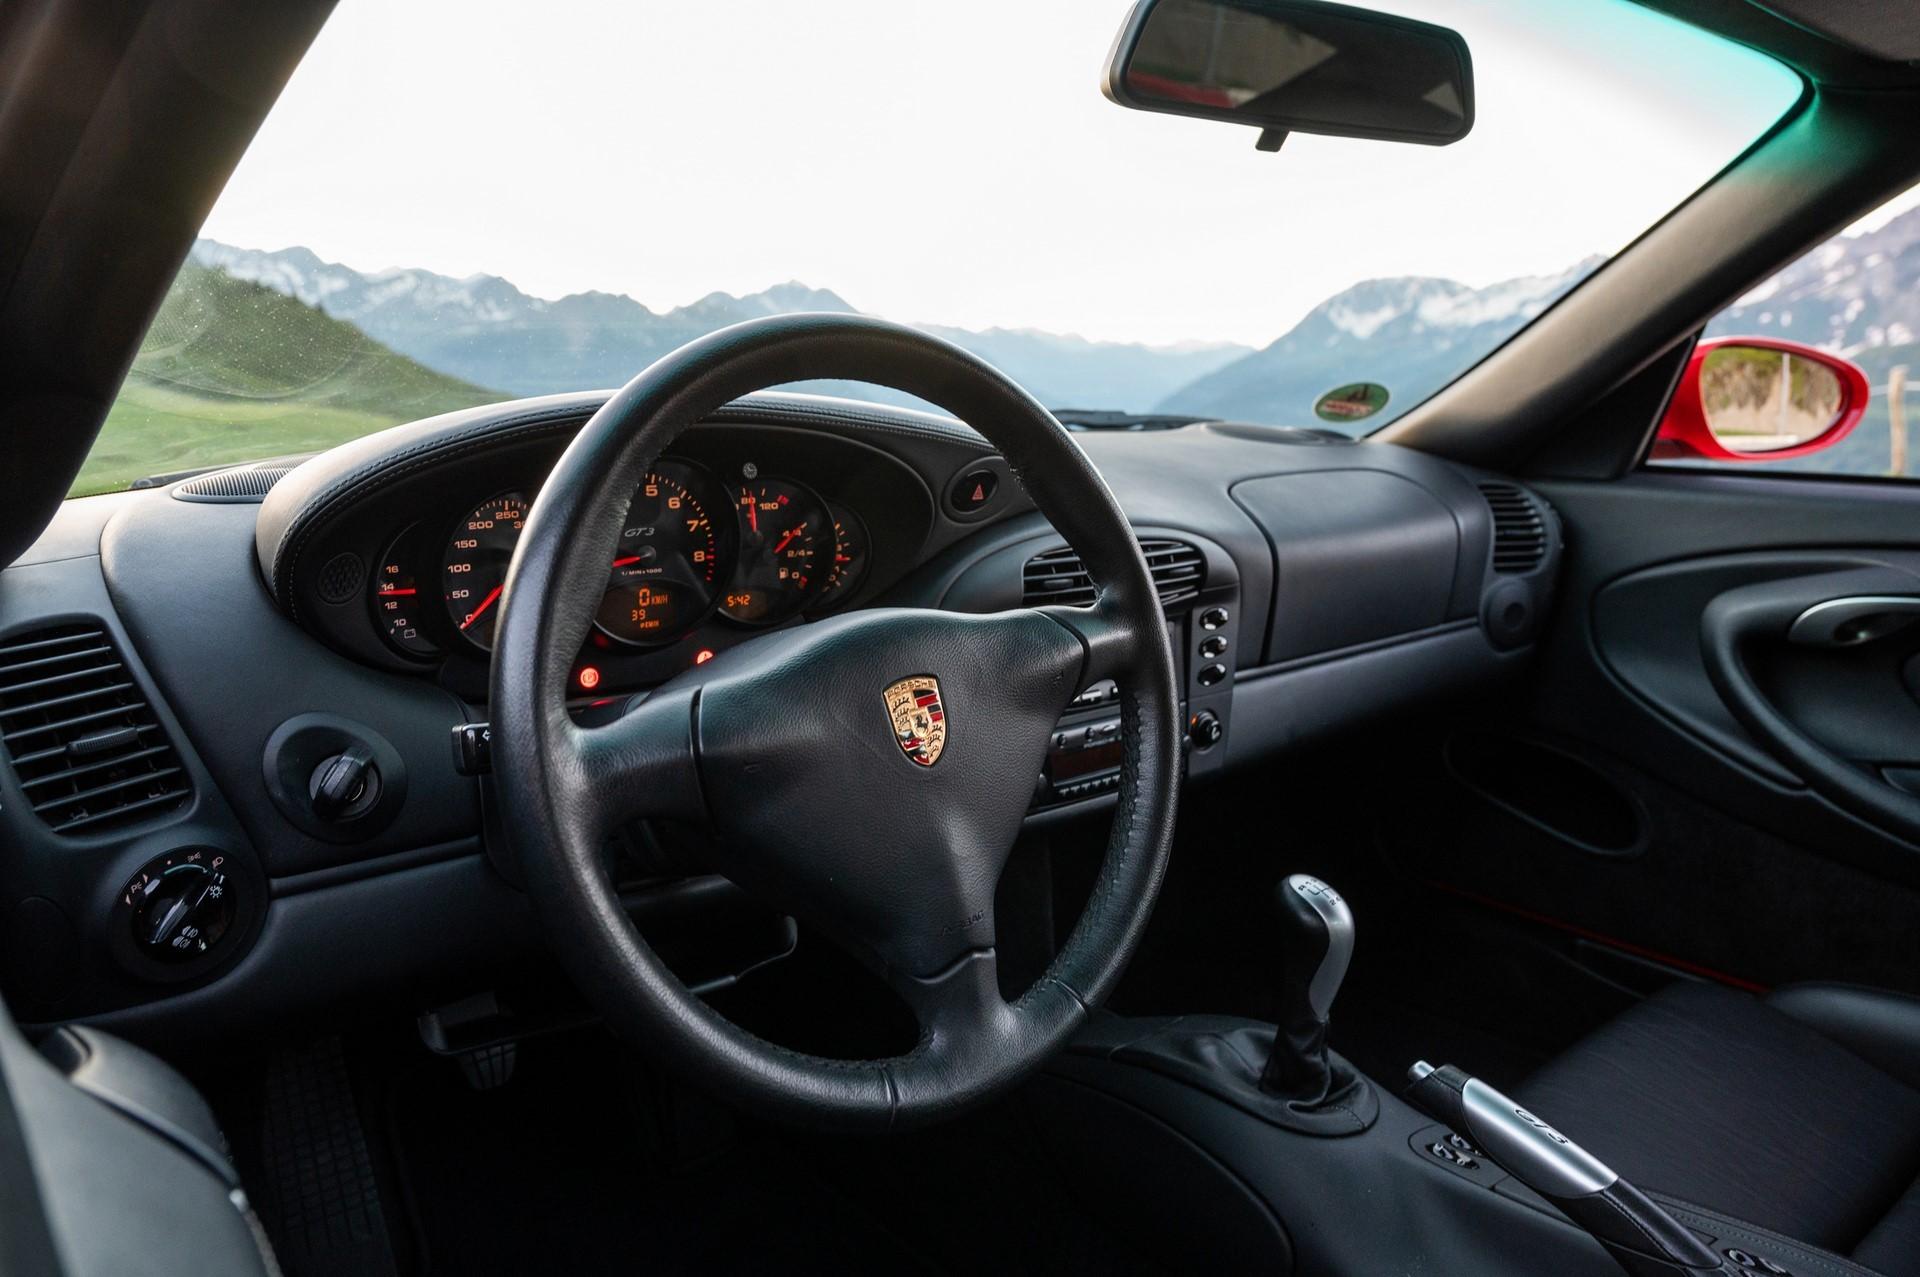 20-years-of-the-Porsche-911-GT3-21